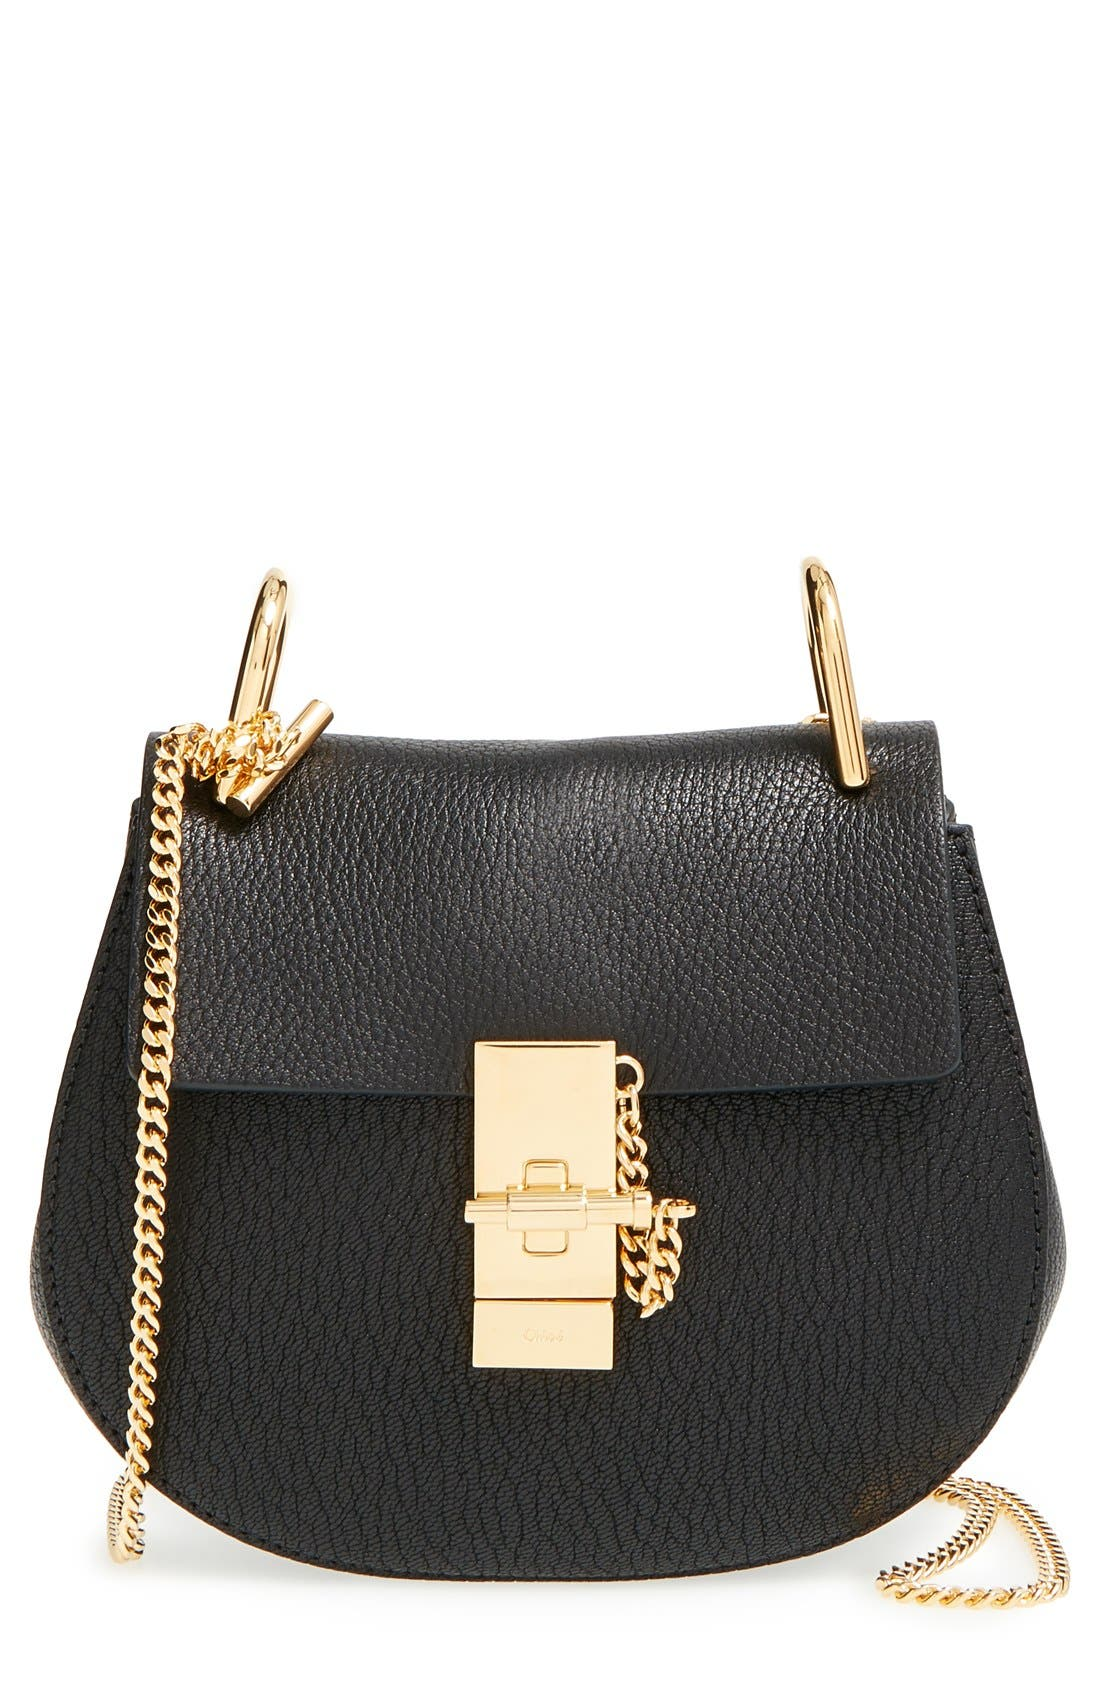 Main Image - Chloé 'Mini Drew' Leather Shoulder Bag